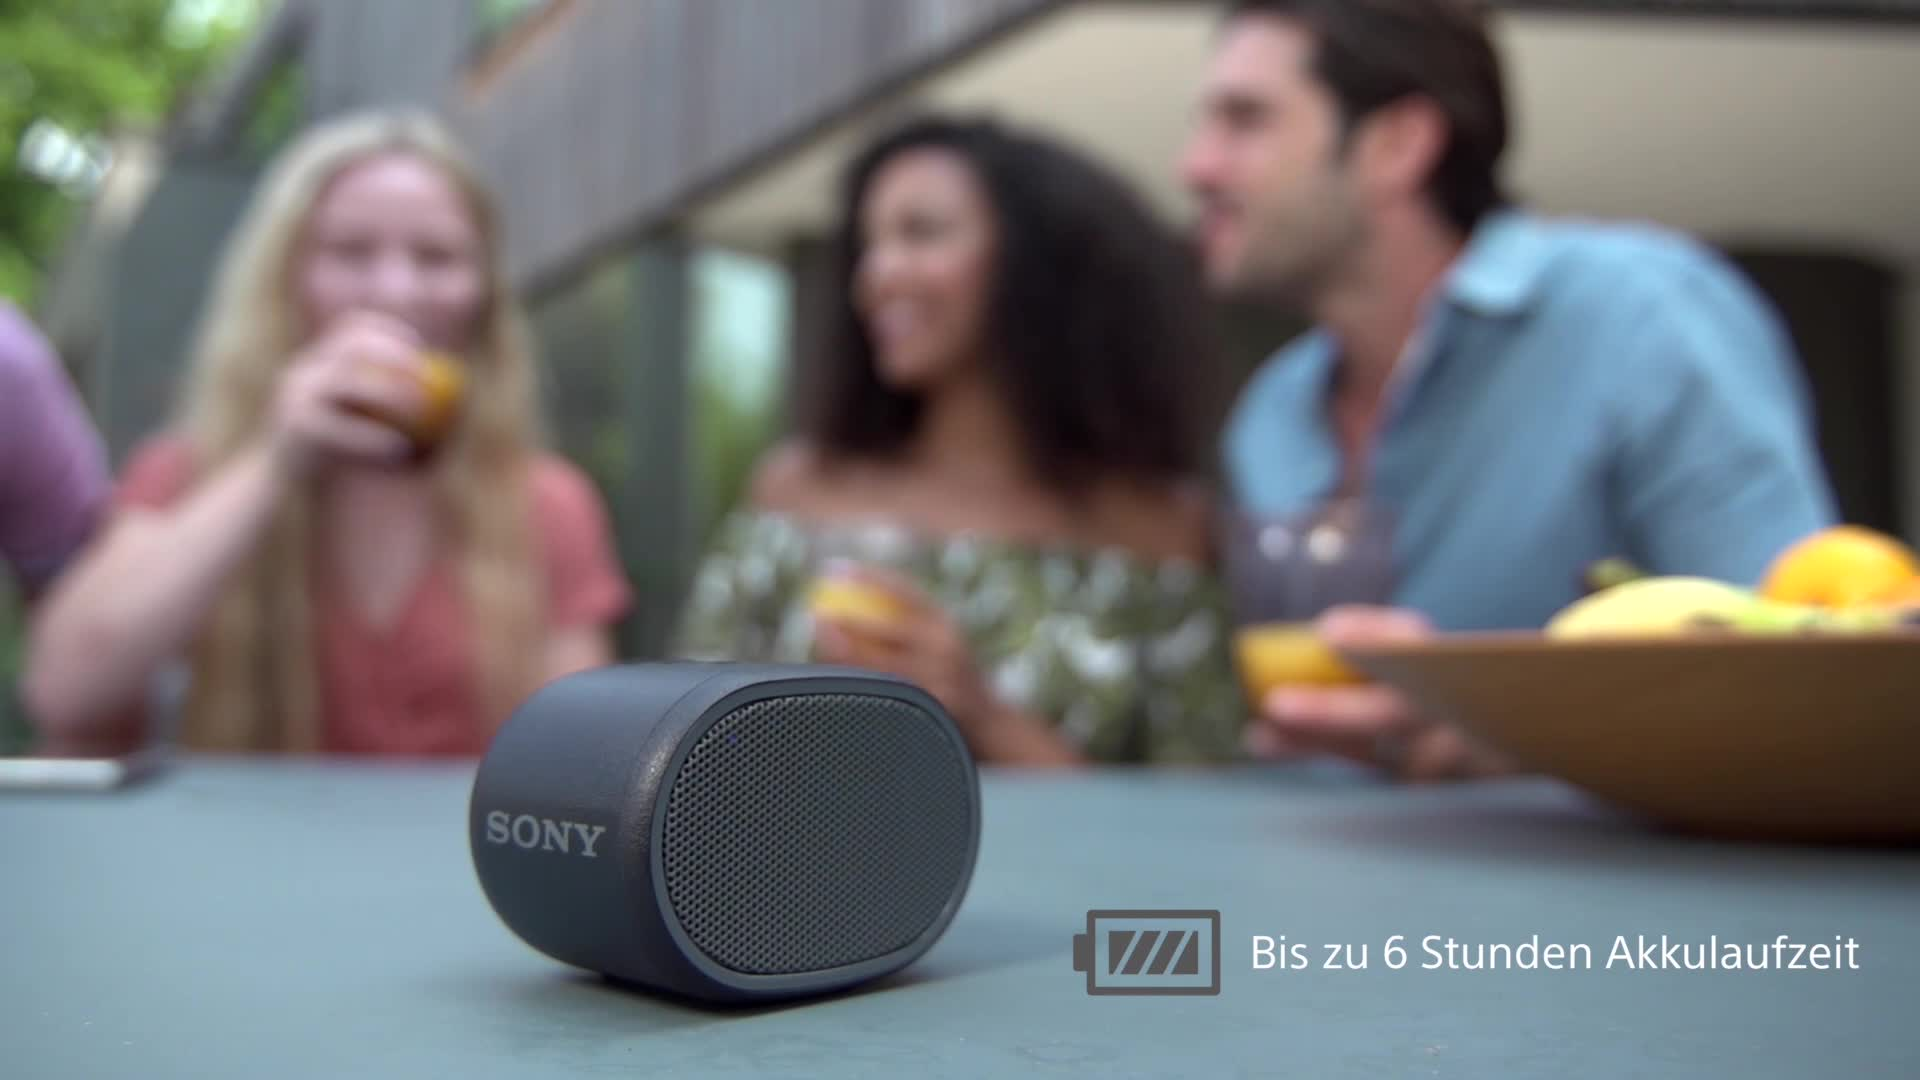 Sony Srs Xb01 Tragbarer Bluetooth Lautsprecher Extra Bass 6h Akku Spritzwassergeschützt Schwarz Audio Hifi